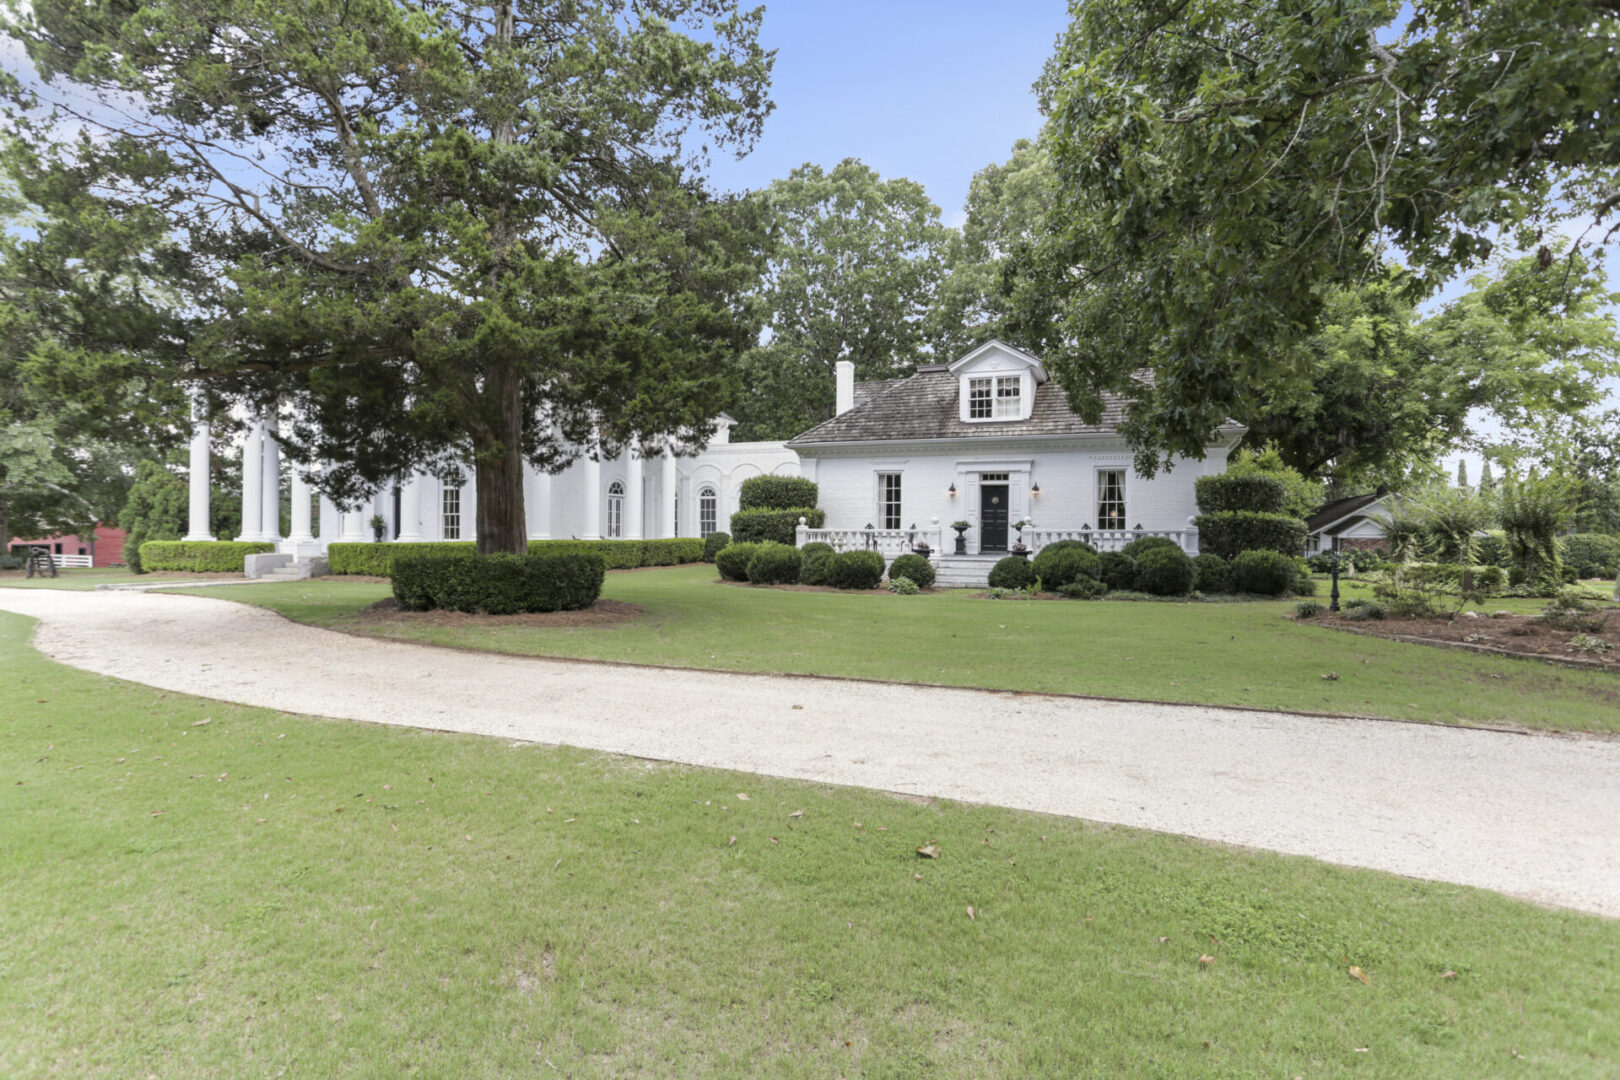 Rustic 1840's farm home with sprawling yard at Serenata Farm in Madison, GA